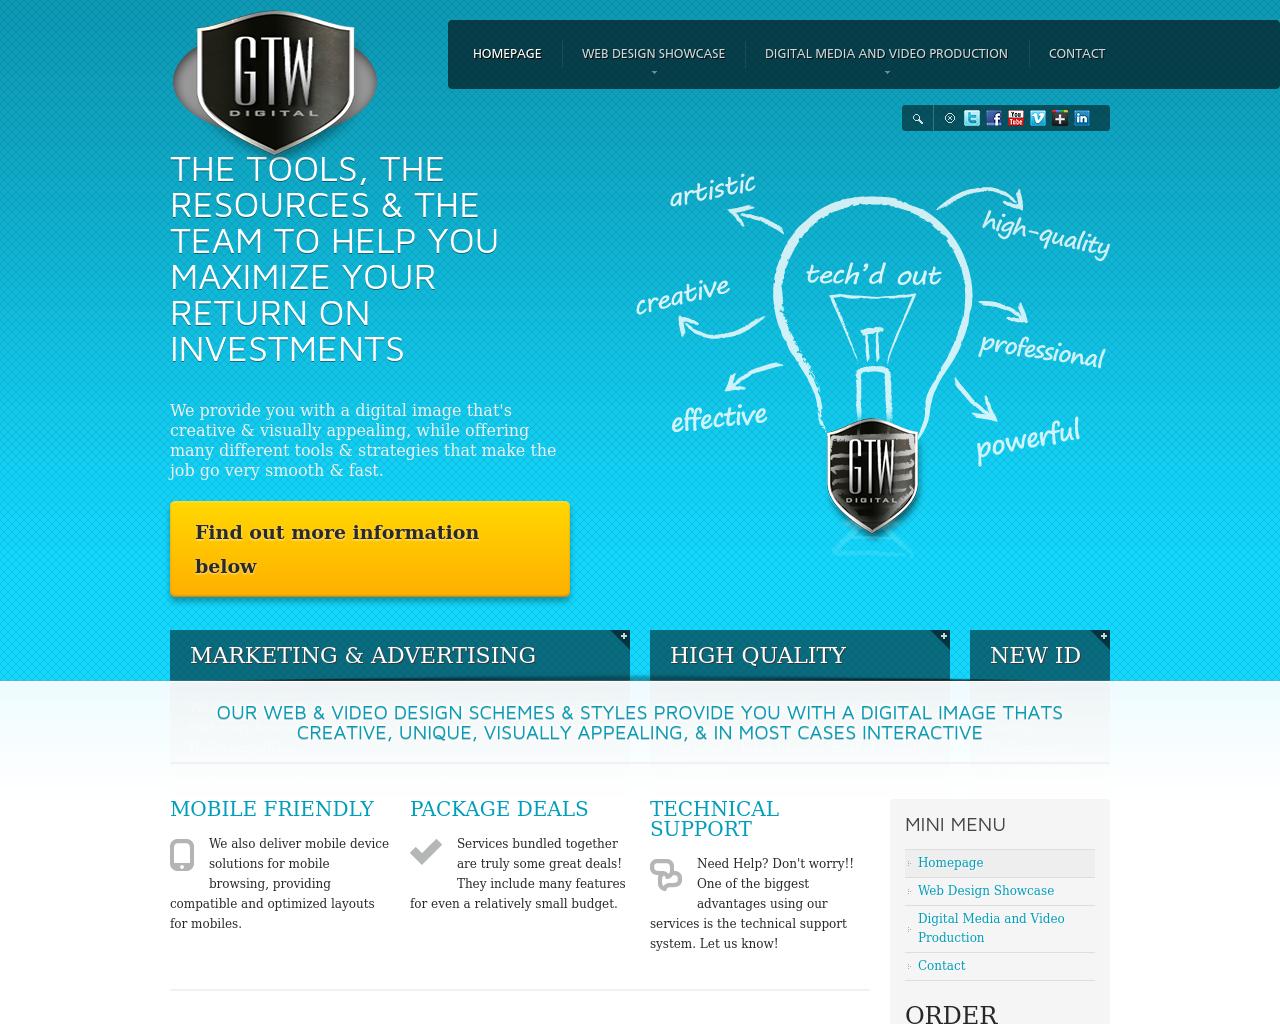 GTW-Digital-Advertising-Reviews-Pricing